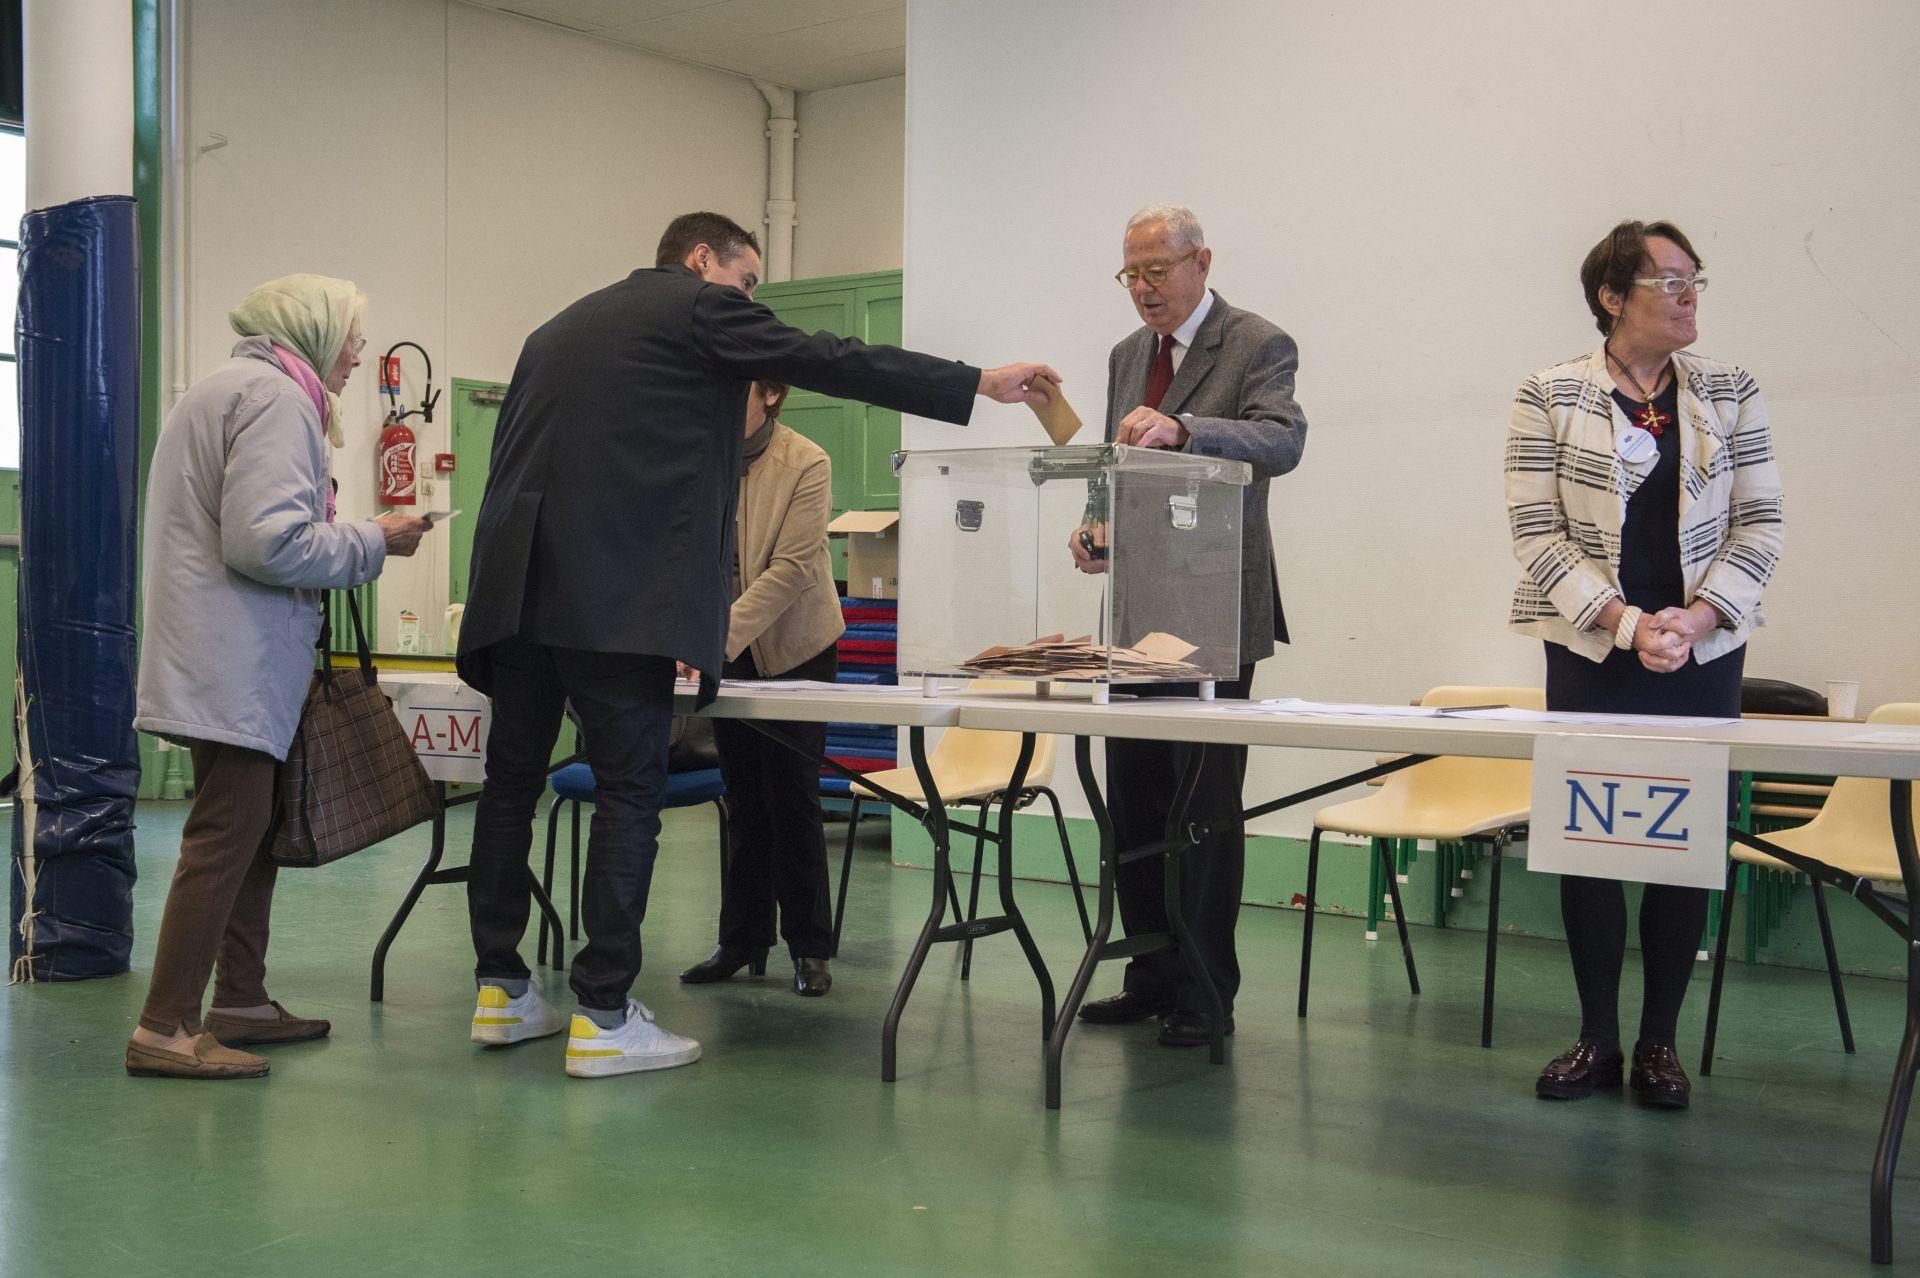 ANKETA Fillon i Macron lako pobjeđuju Le Pen u drugom krugu